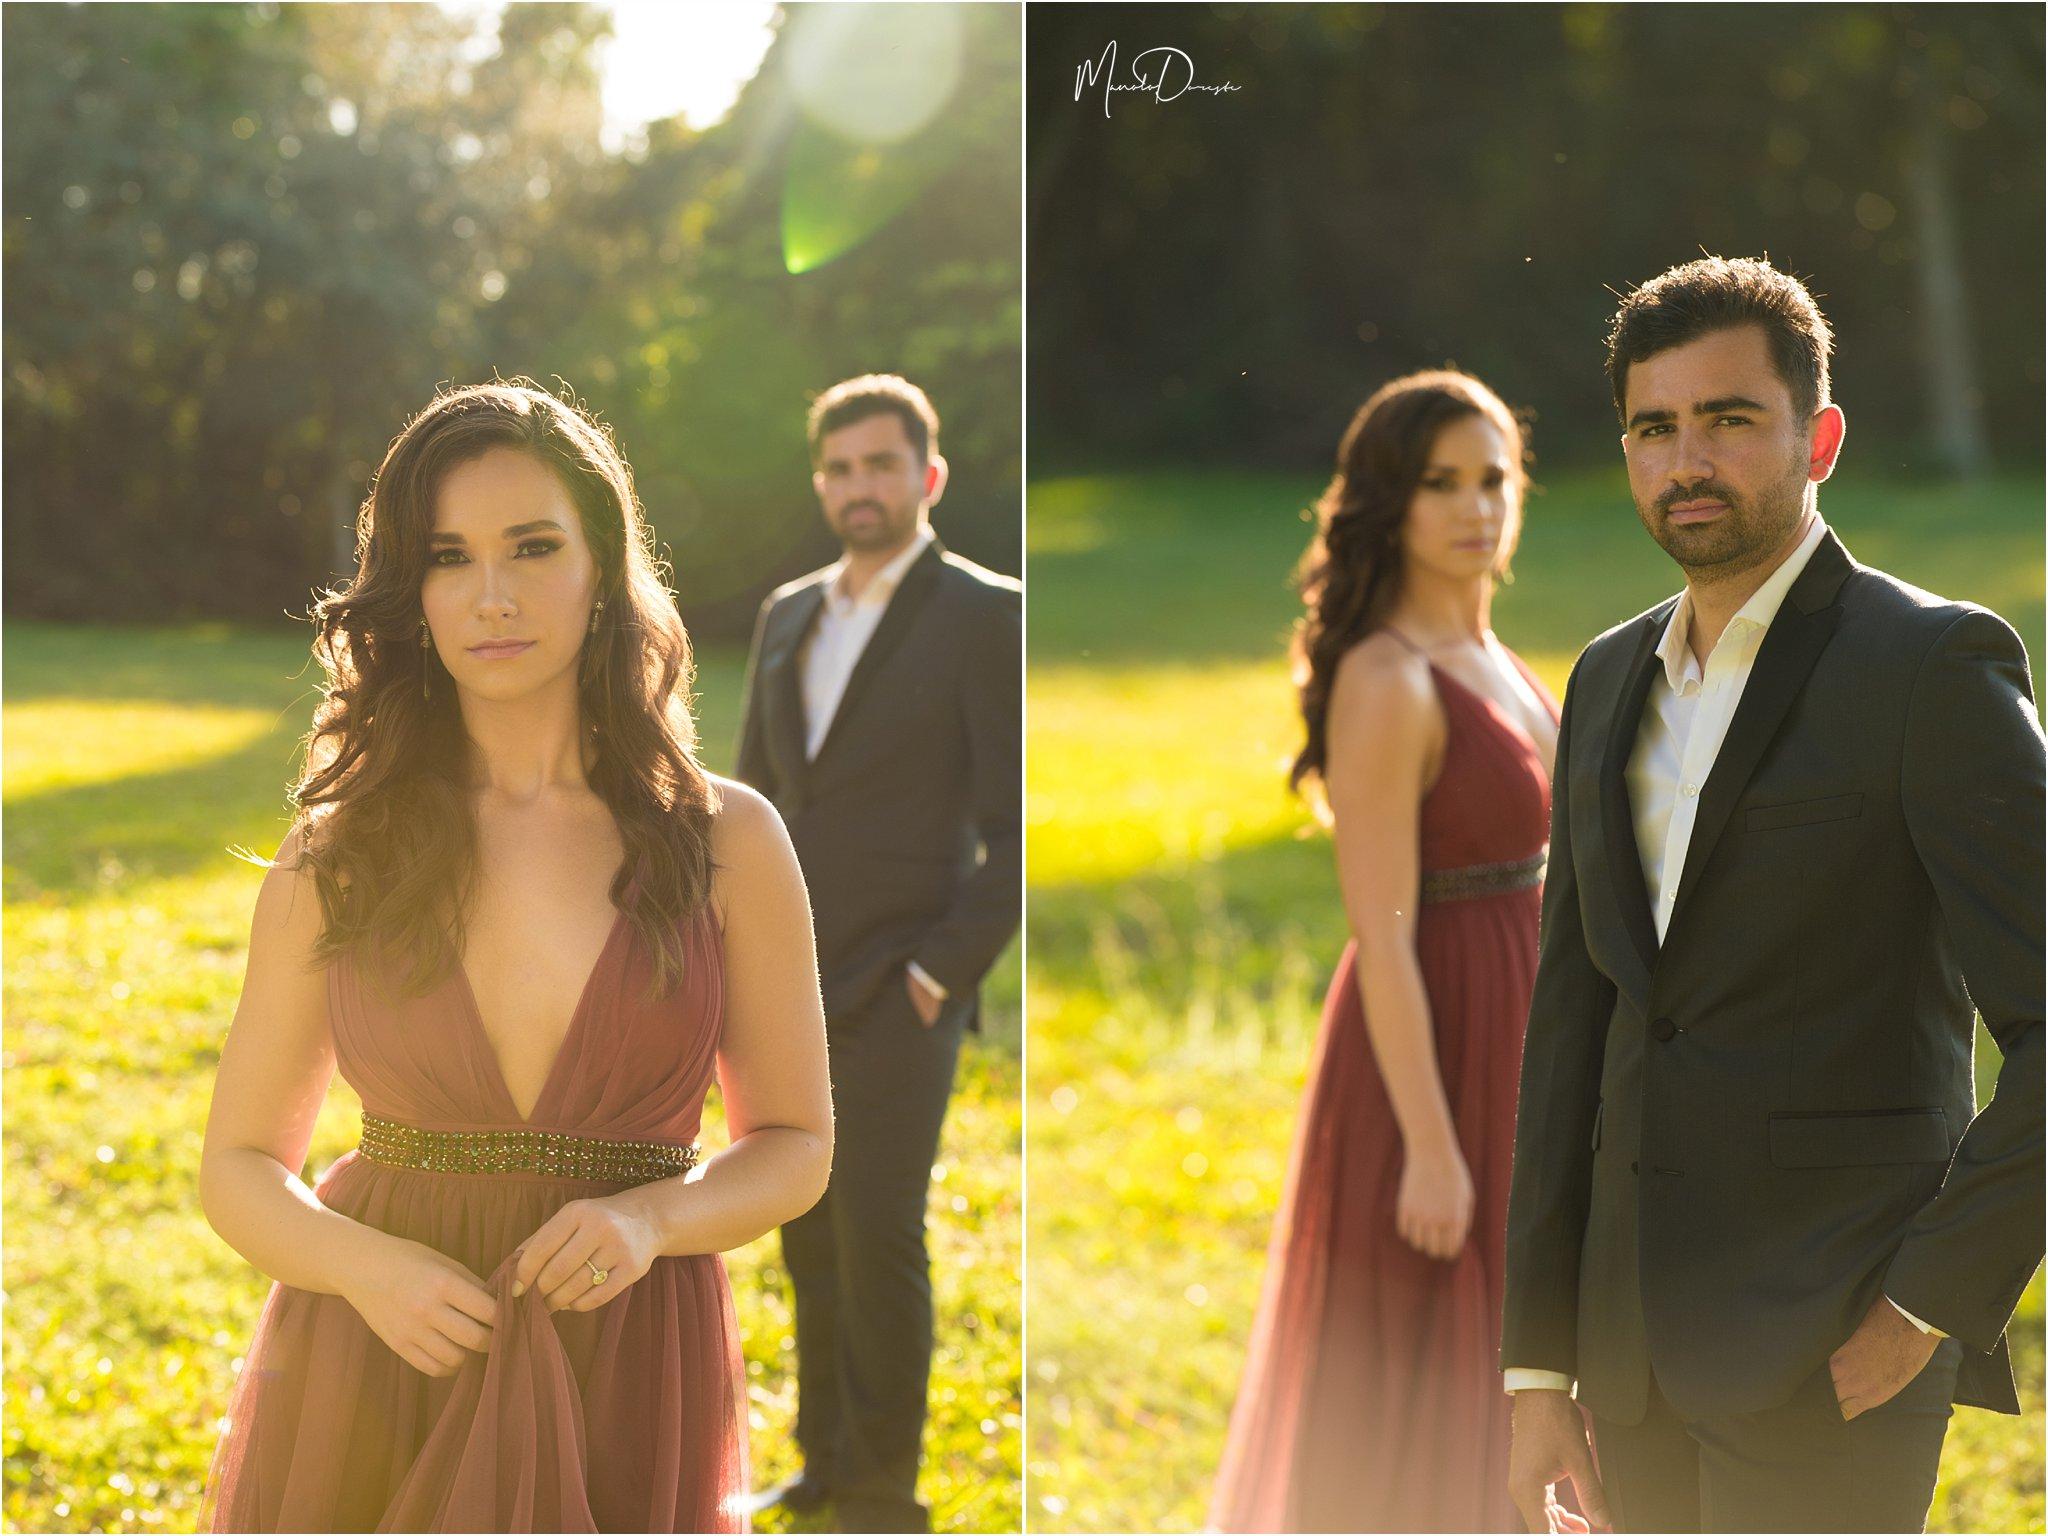 00818_ManoloDoreste_InFocusStudios_Wedding_Family_Photography_Miami_MiamiPhotographer.jpg